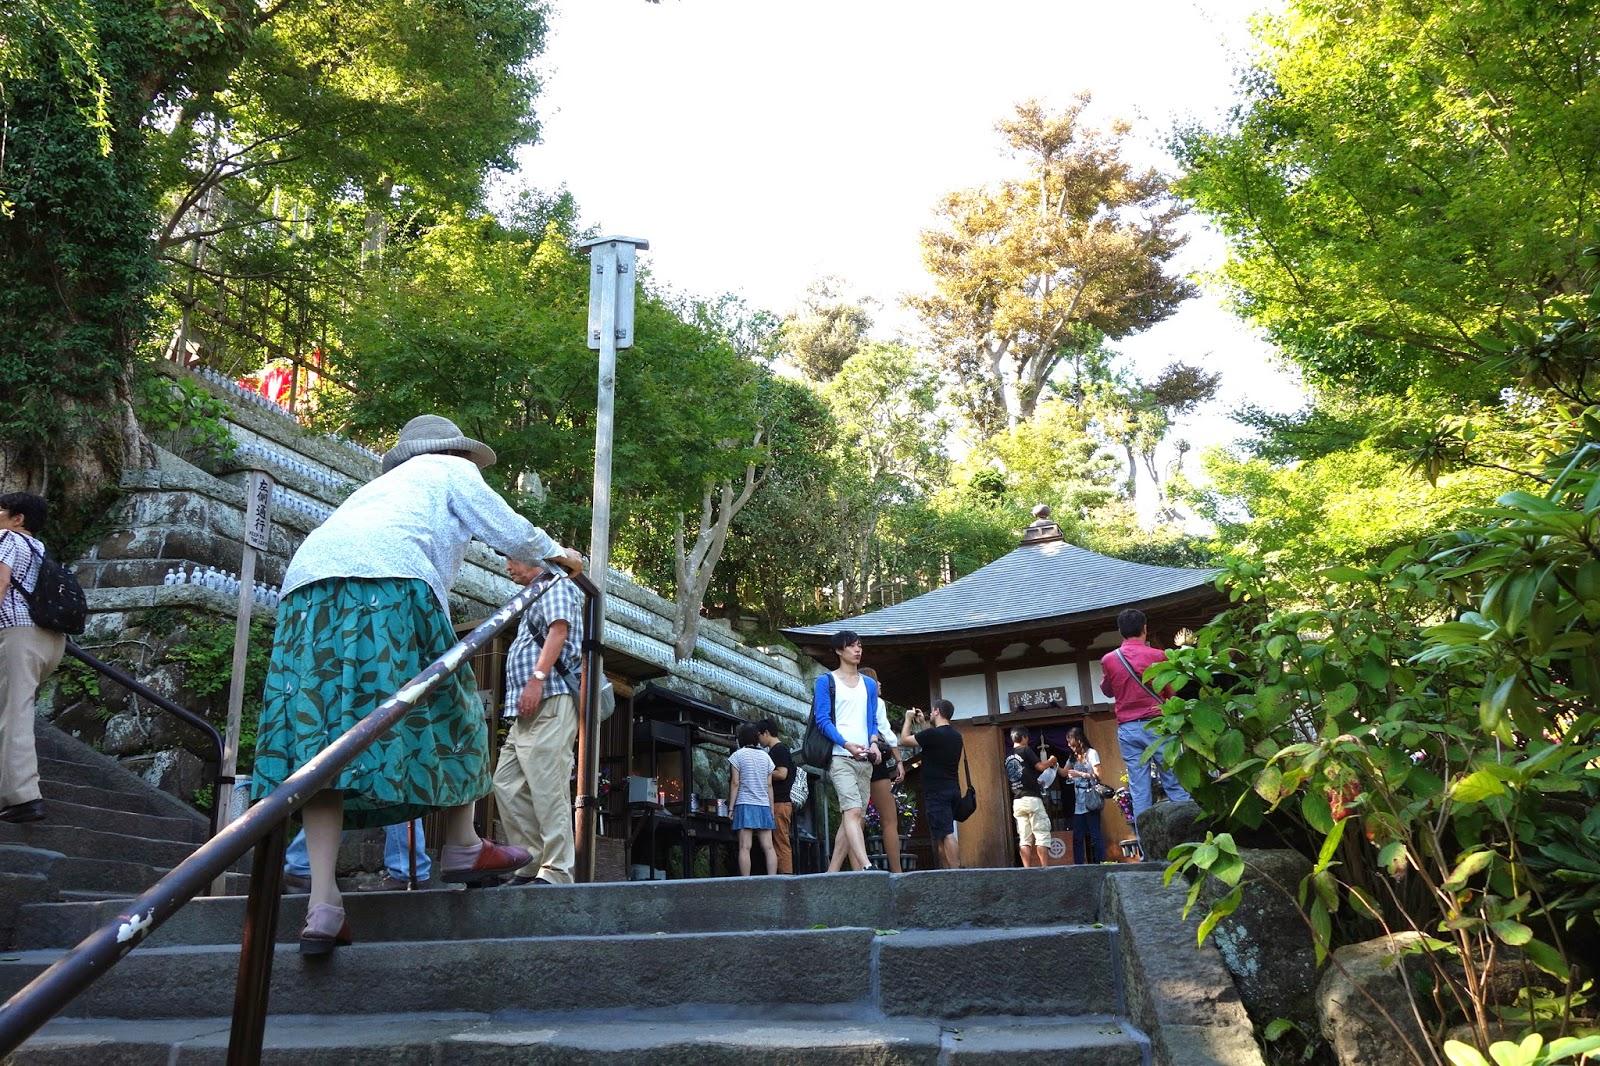 Hasedera 長谷寺 temple Hase Temple kamakura japan tour trip